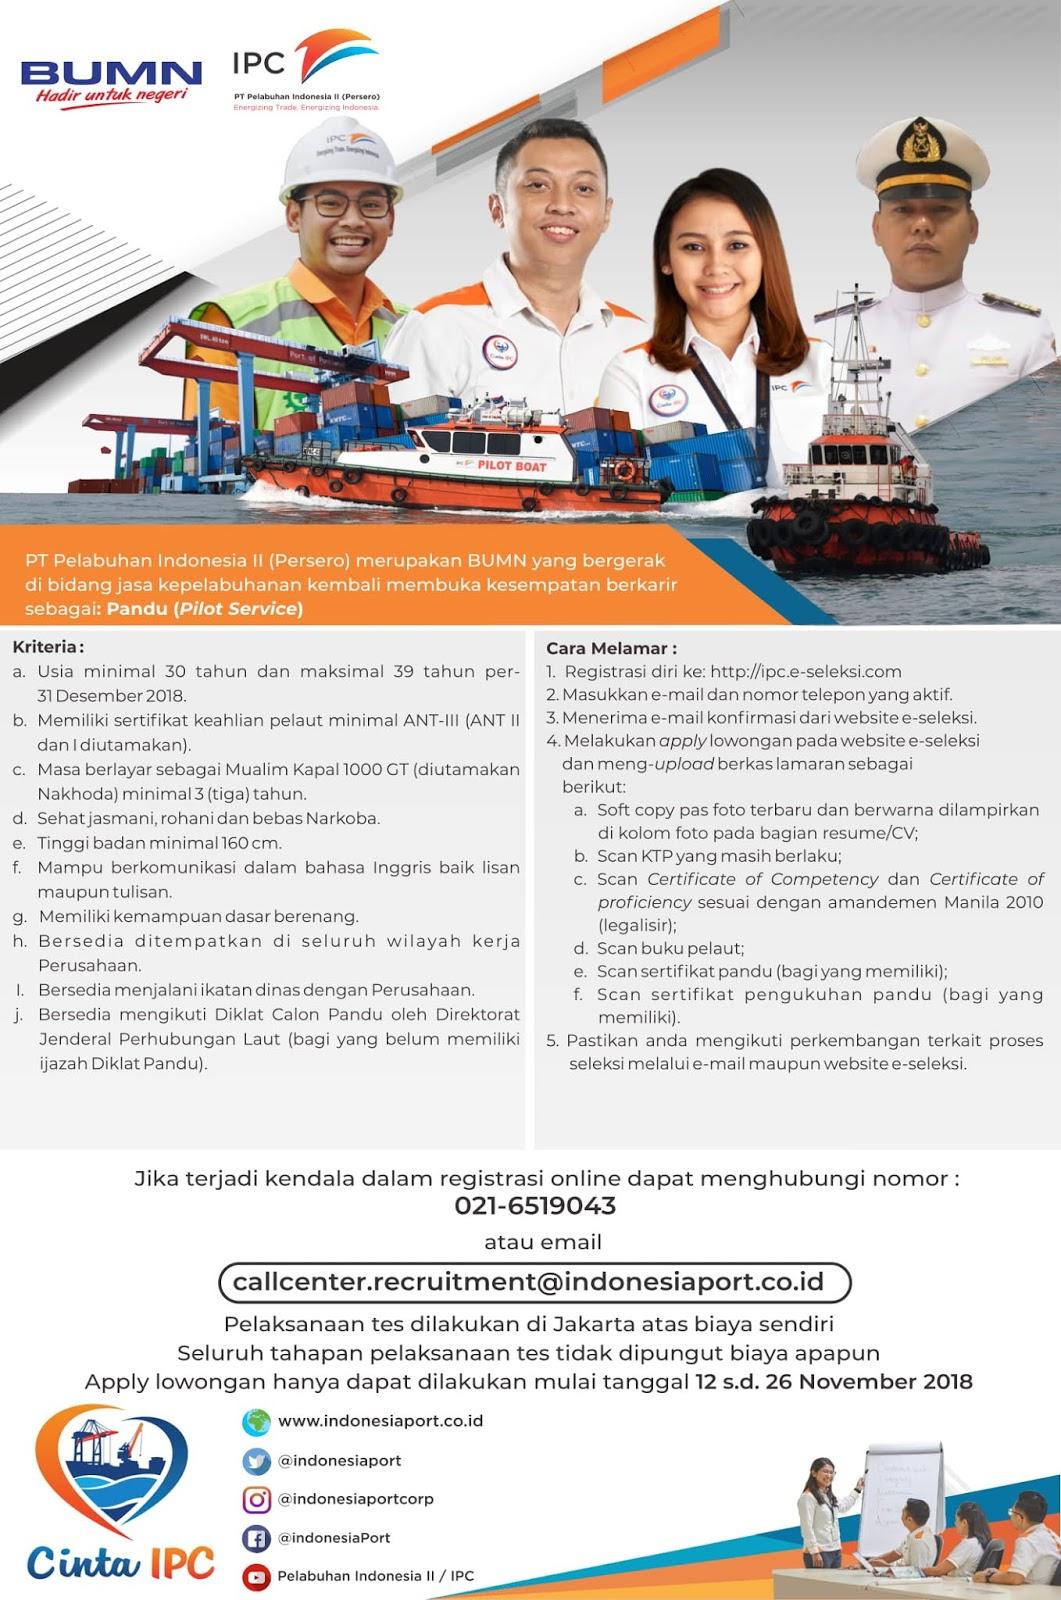 Lowongan Kerja Bumn Pt Pelabuhan Indonesia Ii Persero Deadline 26 November 2018 Rekrutmen Dan Lowongan Kerja Bulan Februari 2021